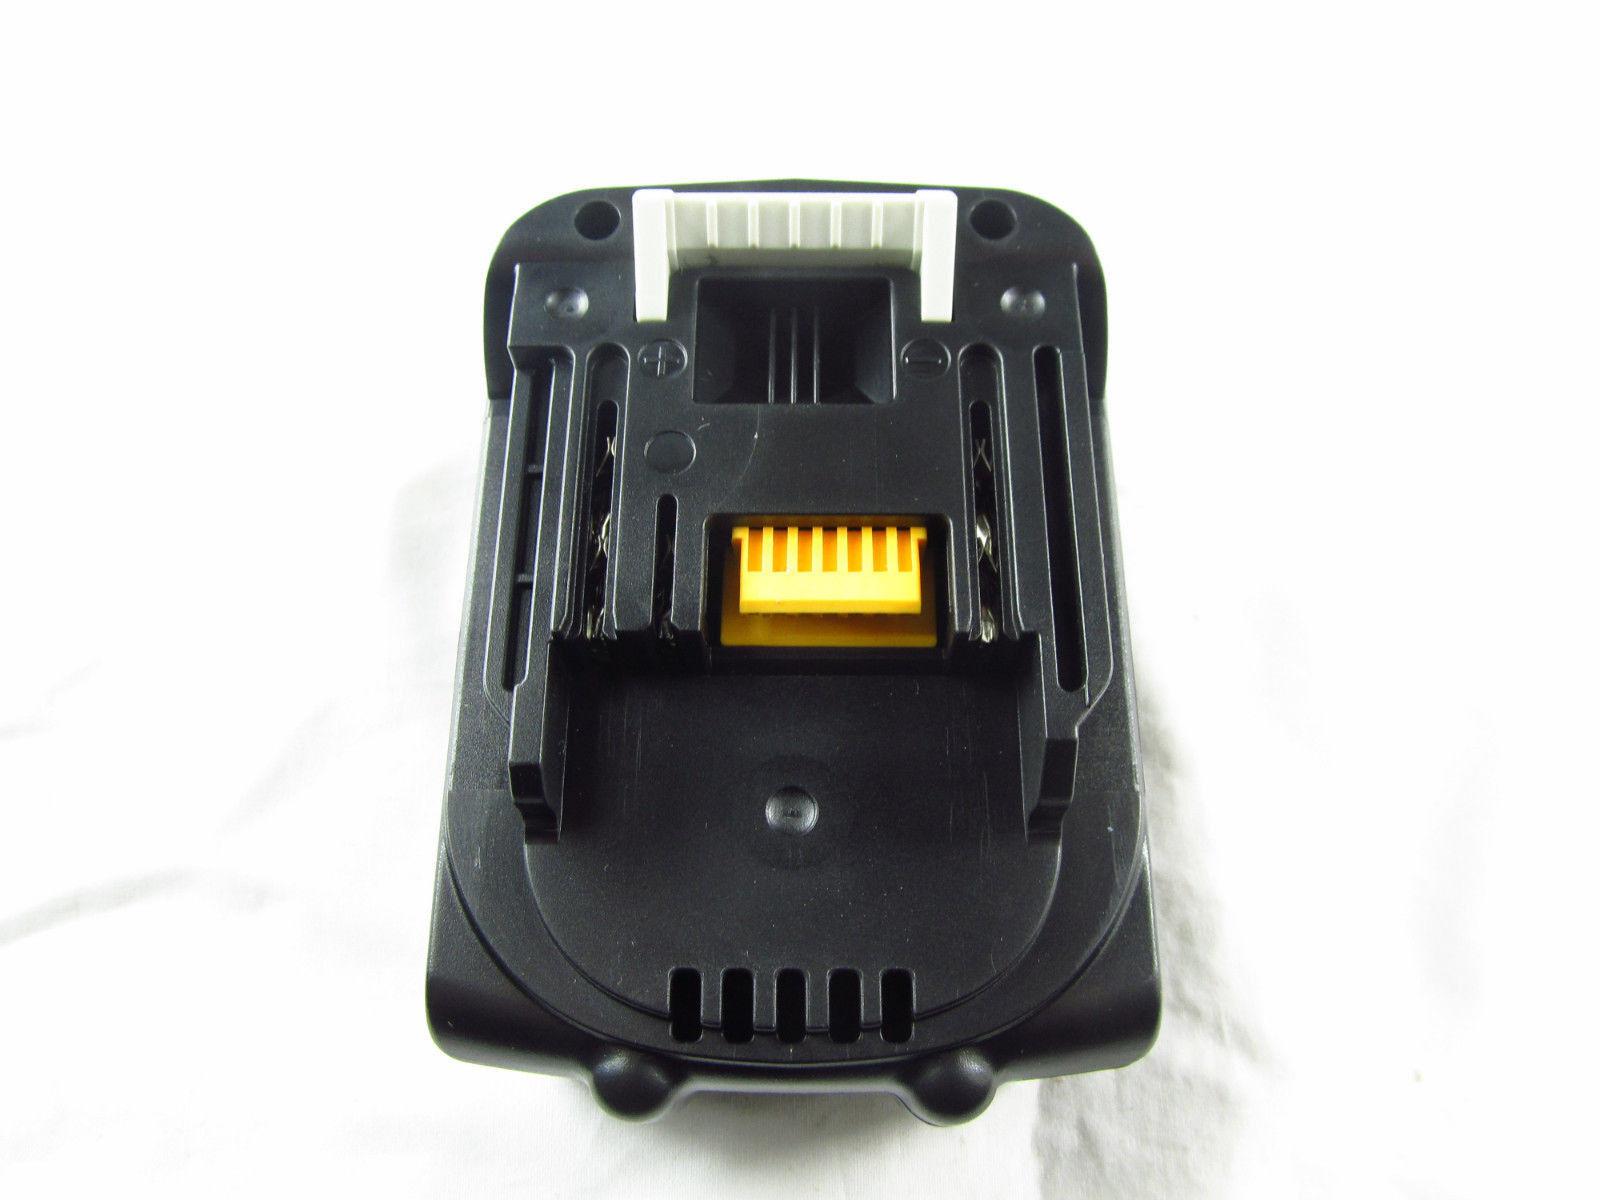 Akku Batterie für Makita BL1430 BL 1430 - Li-ion 14,4V 2.0Ah